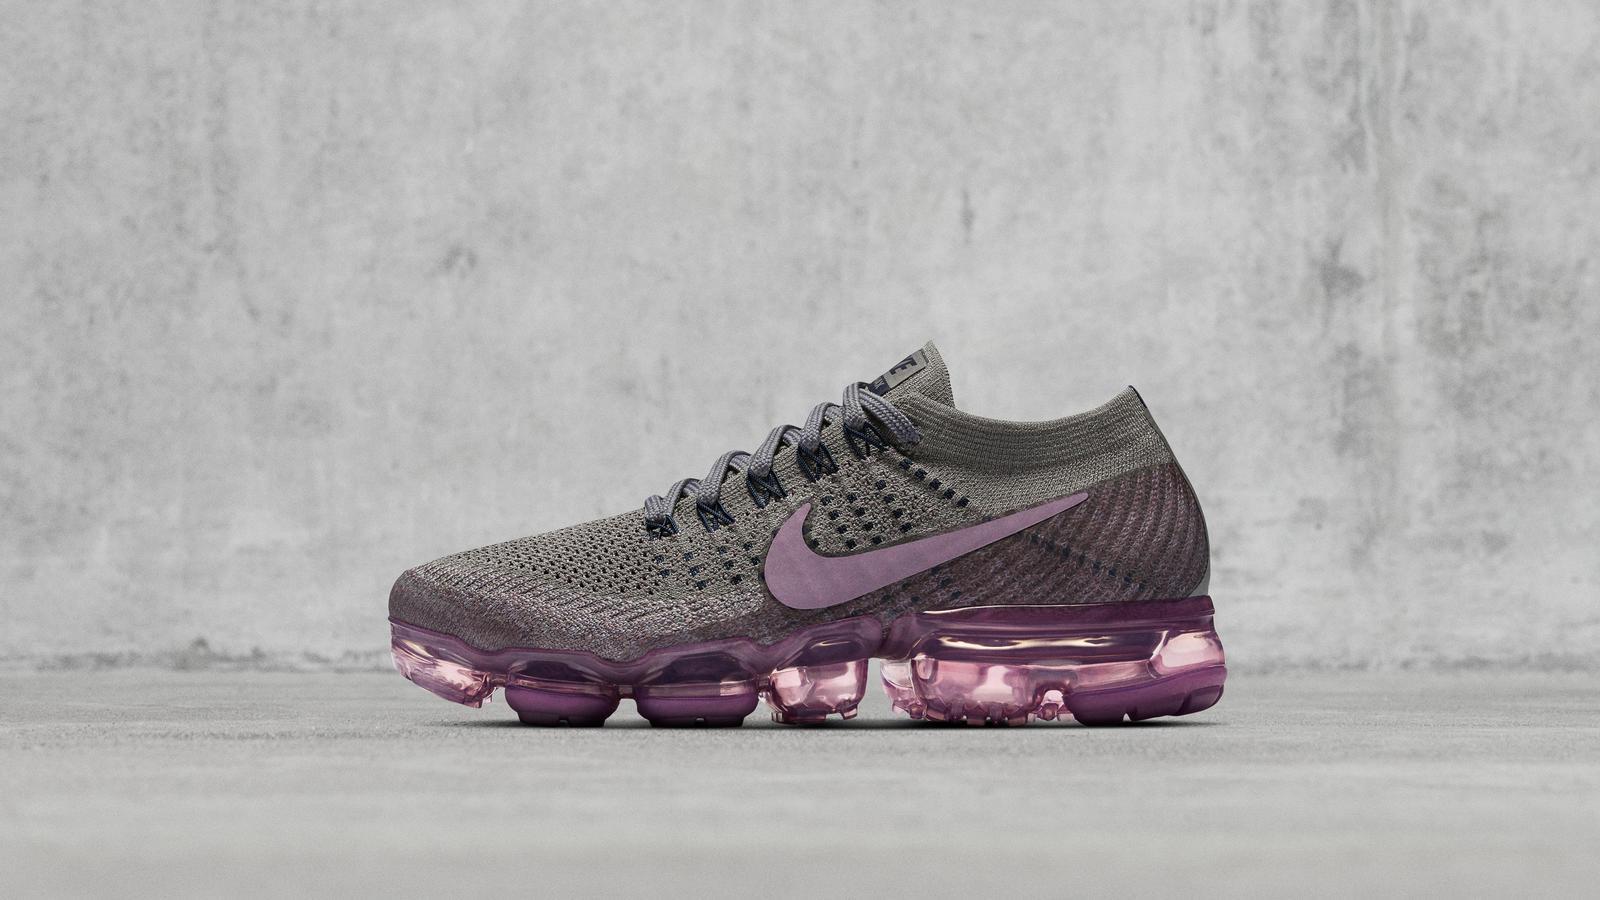 579ff8c0bd7f6 NikeLab Air VaporMax - Nike News